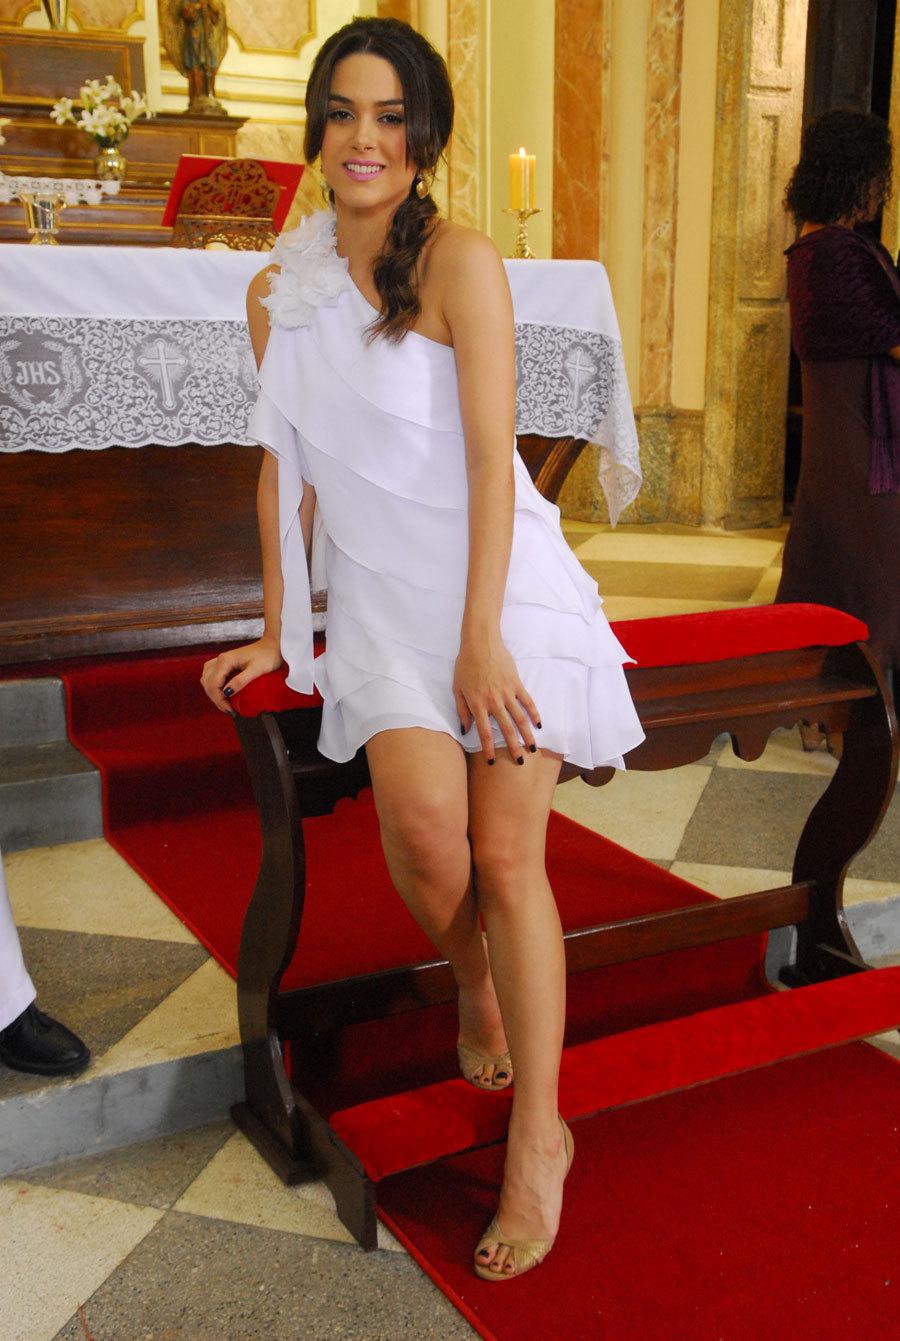 http://pics.wikifeet.com/Fernanda-Machado-Feet-946722.jpg